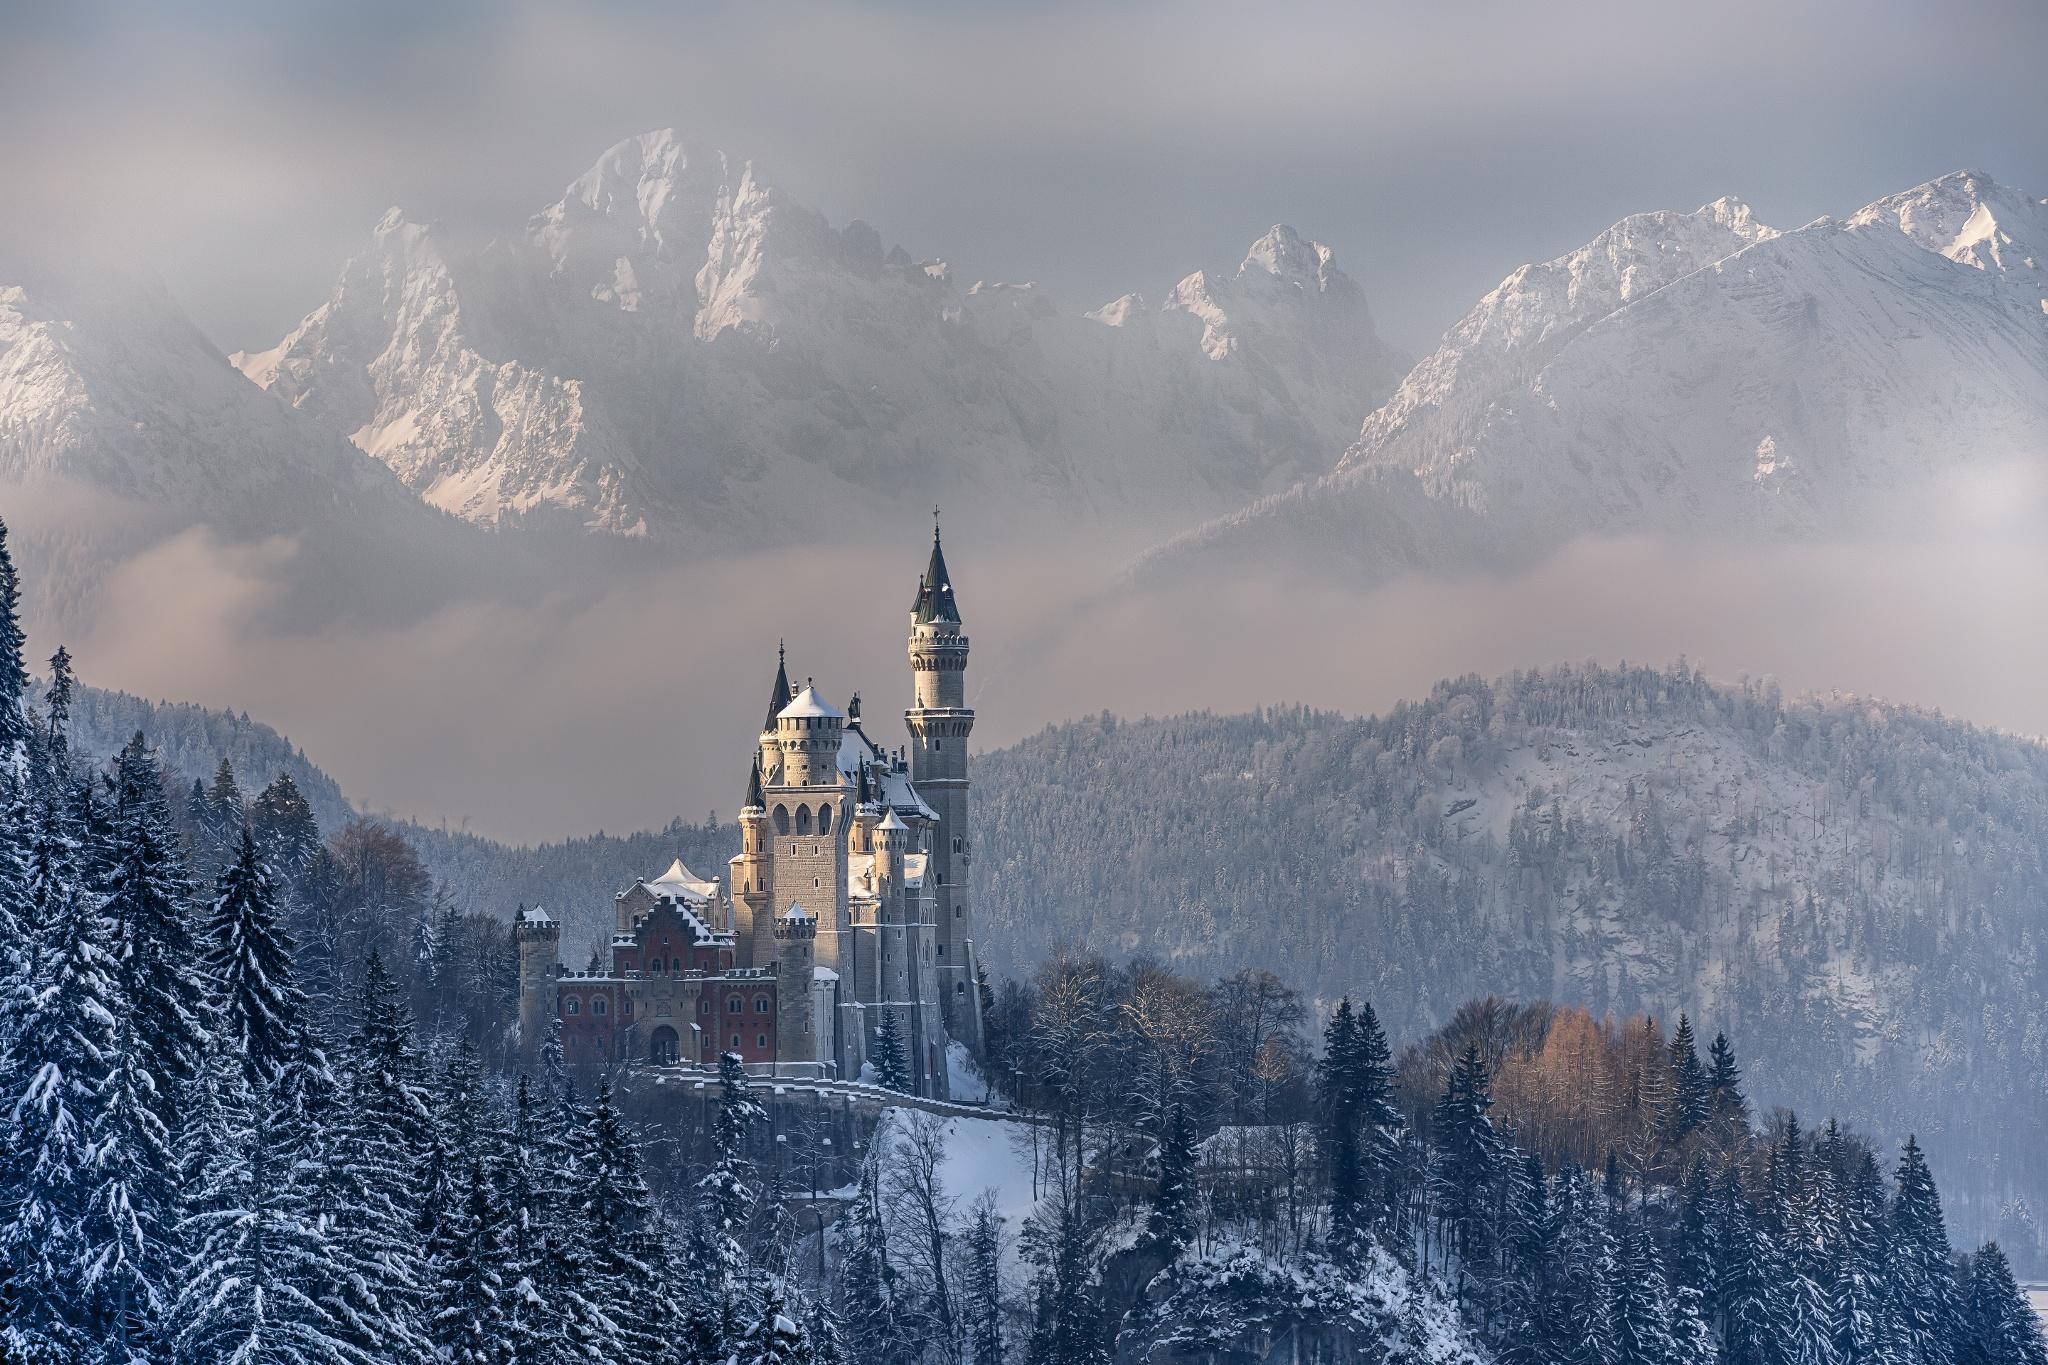 Castles Winter Wallpapers - Wallpaper Cave